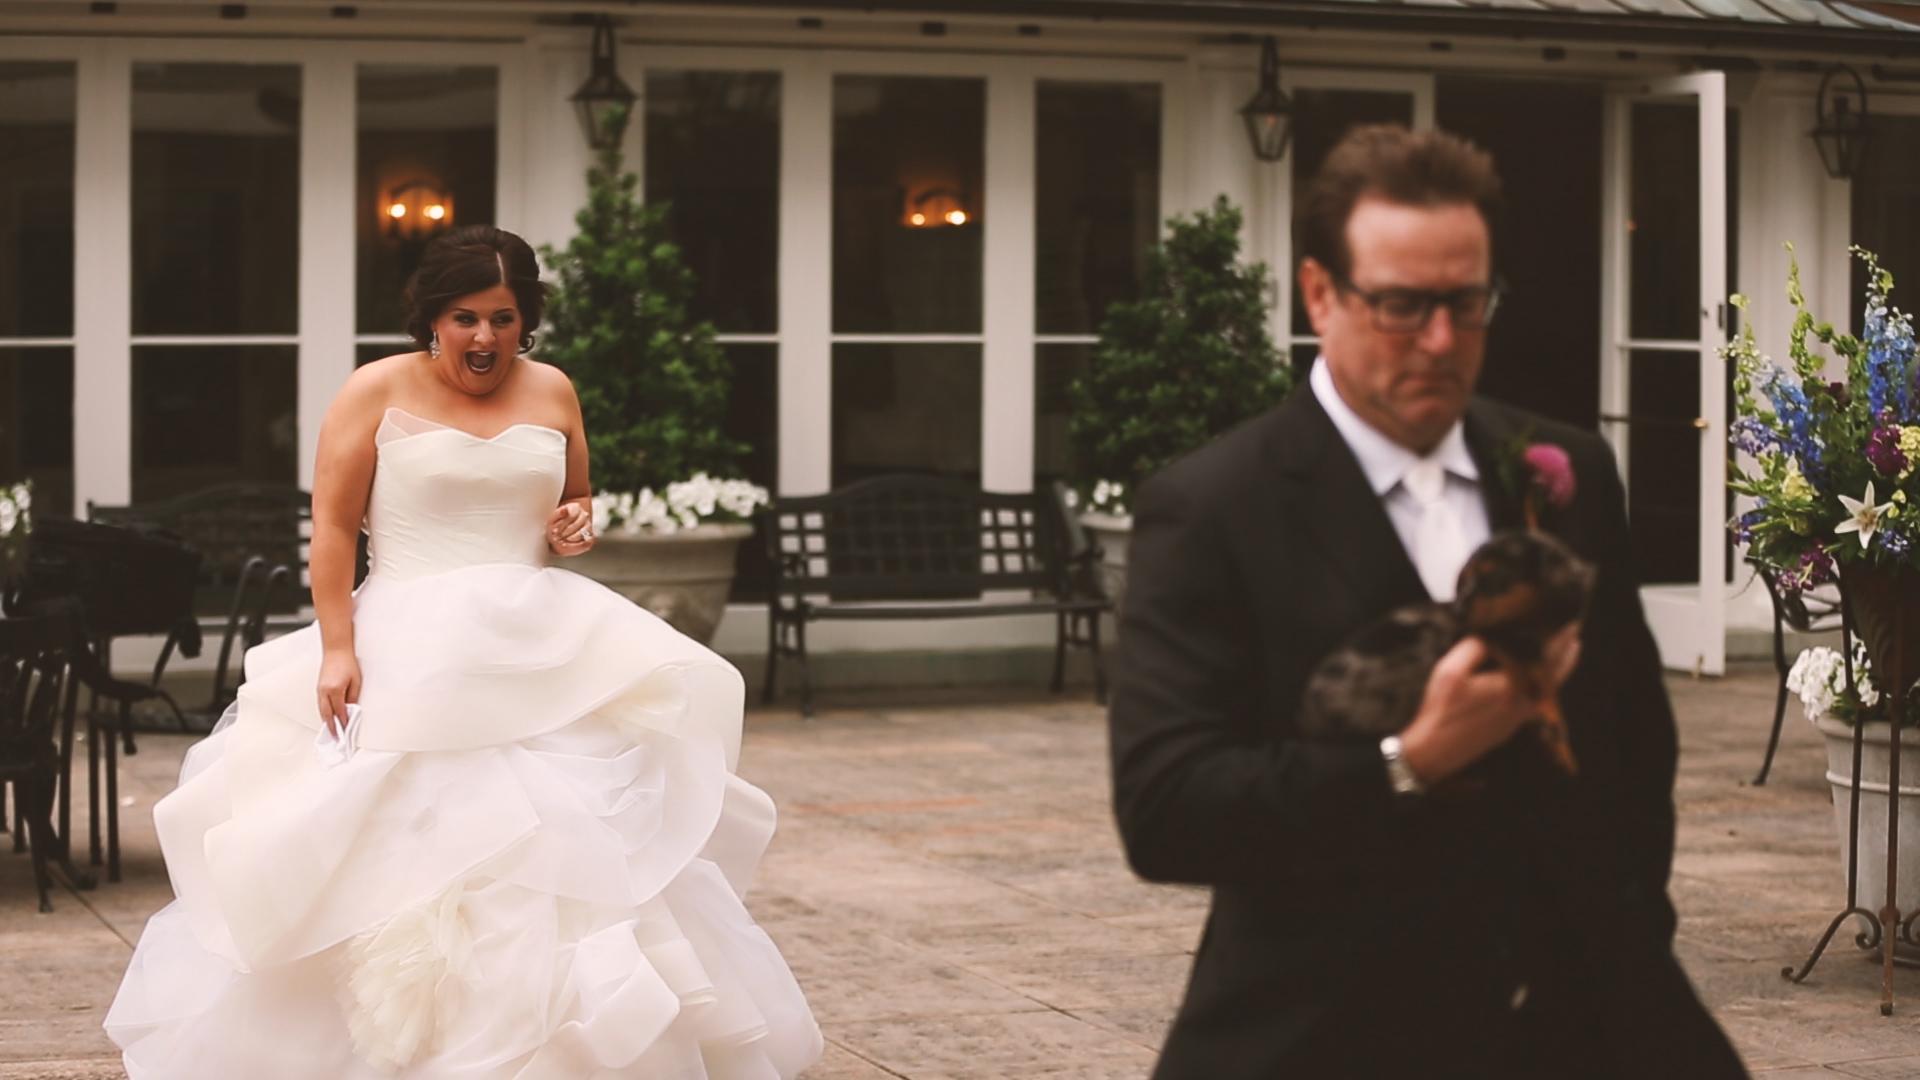 Bride Film - First Look